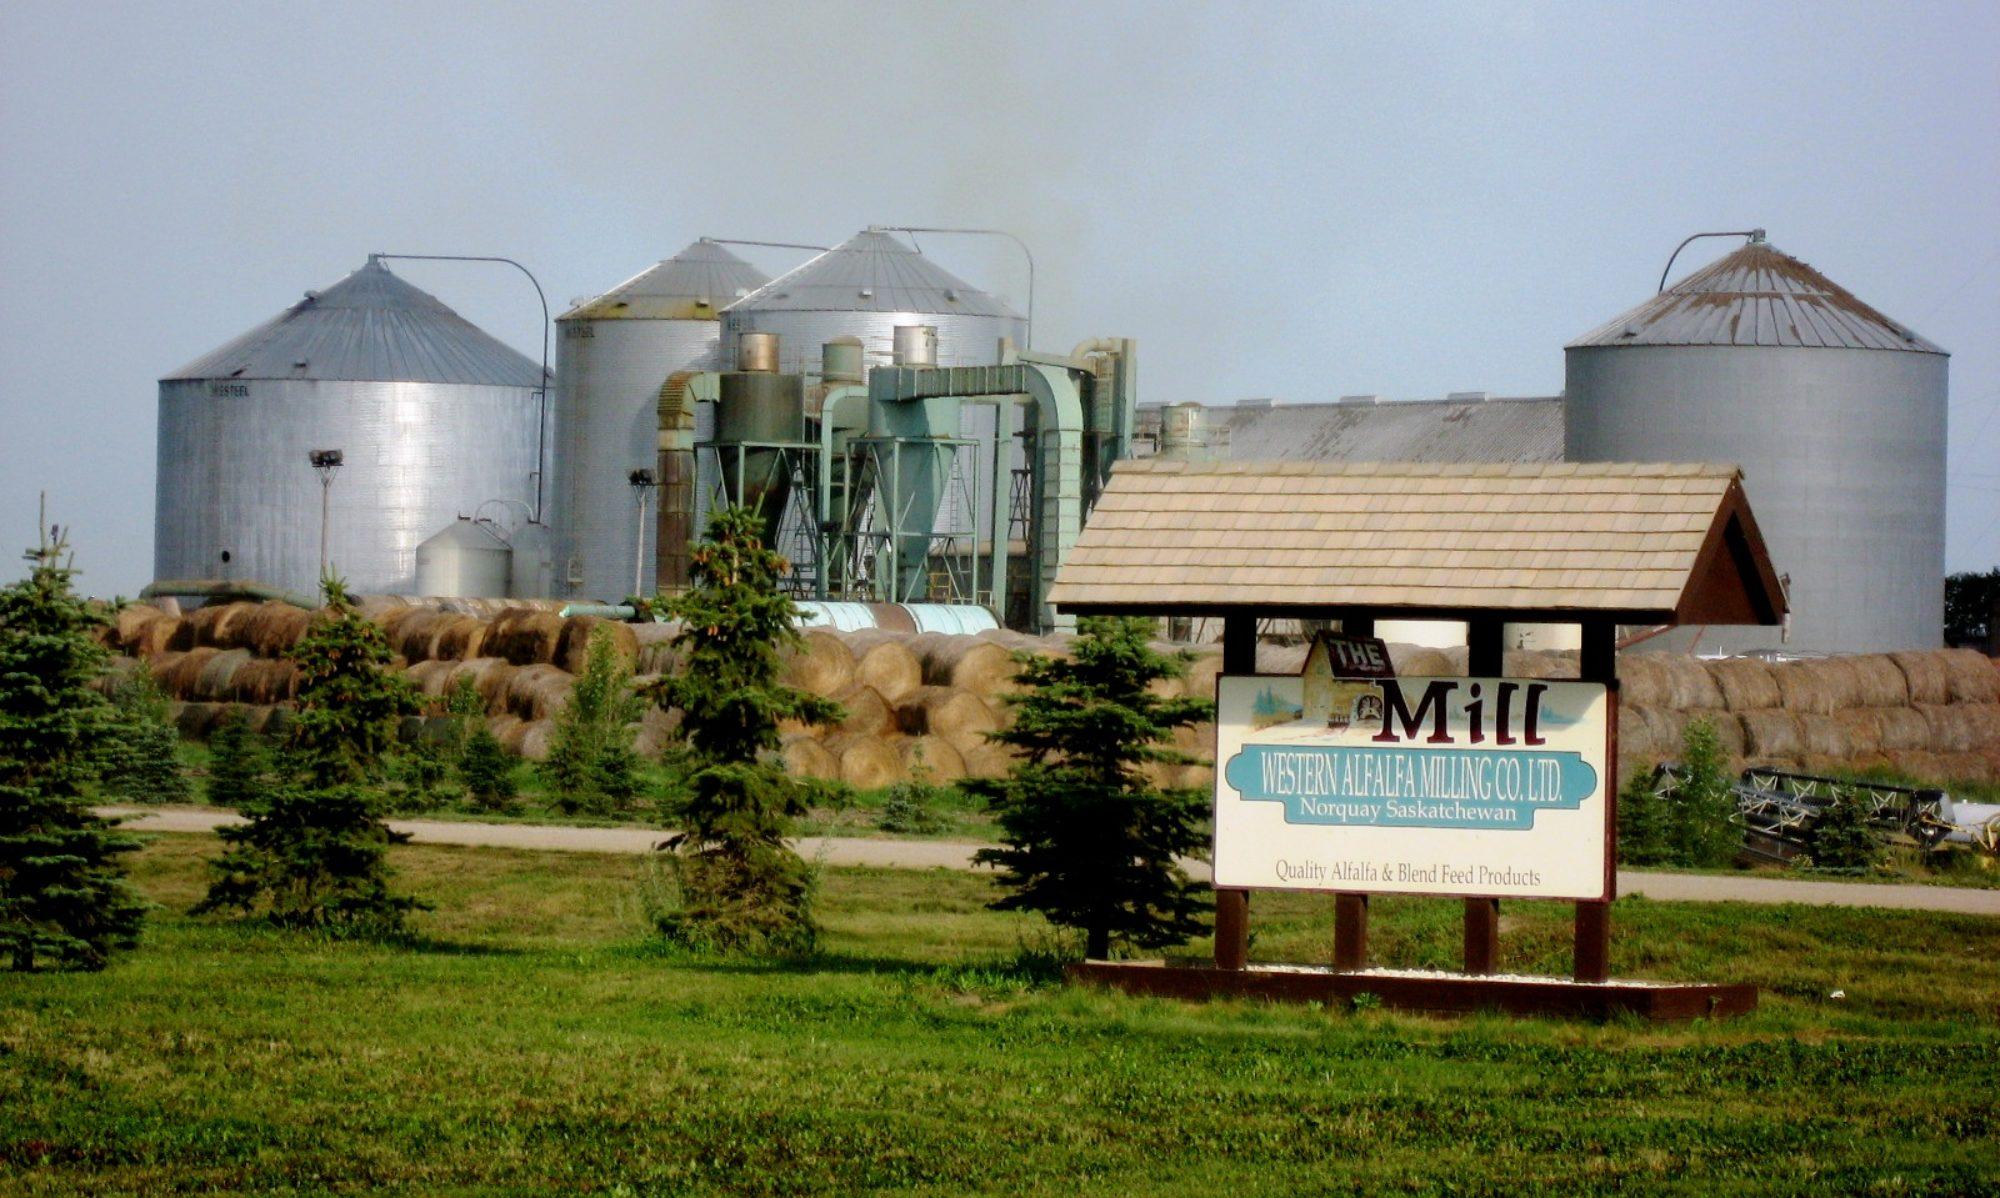 Western Alfalfa Milling Co. Ltd.